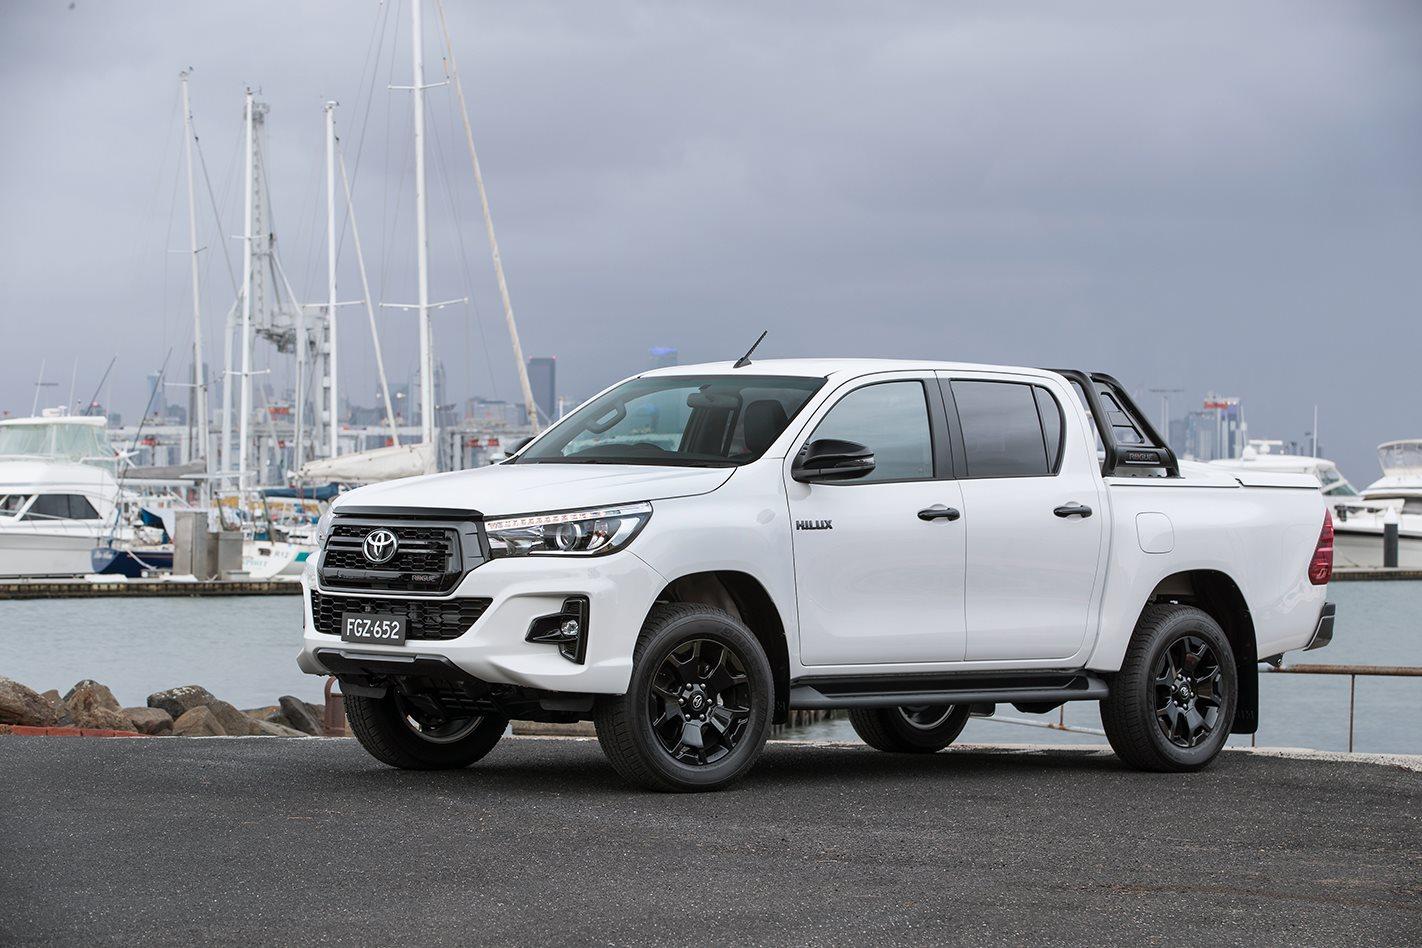 Toyota facing legal action over HiLux, Prado diesel